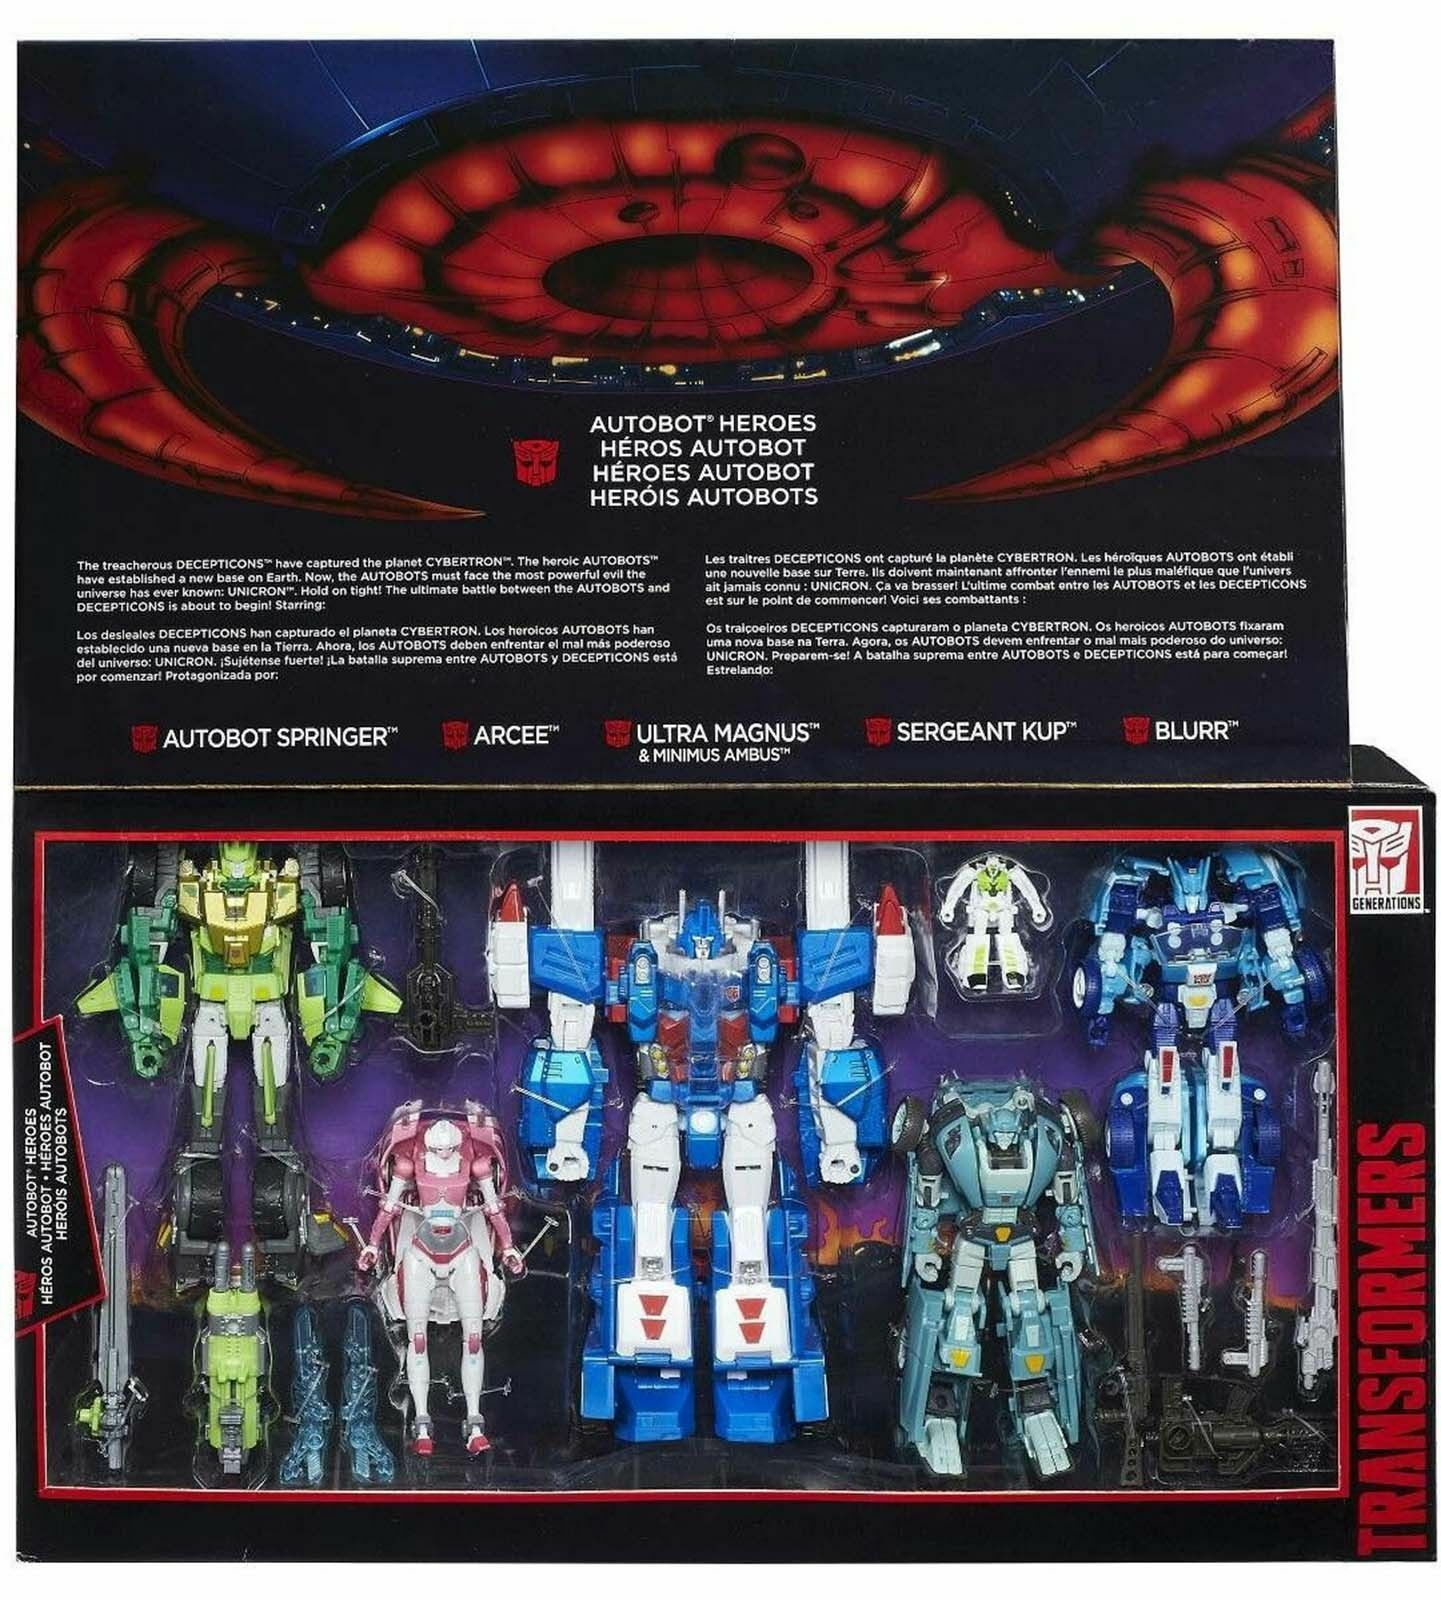 G1 transformers autobot - helden ultra - springer sergeant kup Blaurr heiß